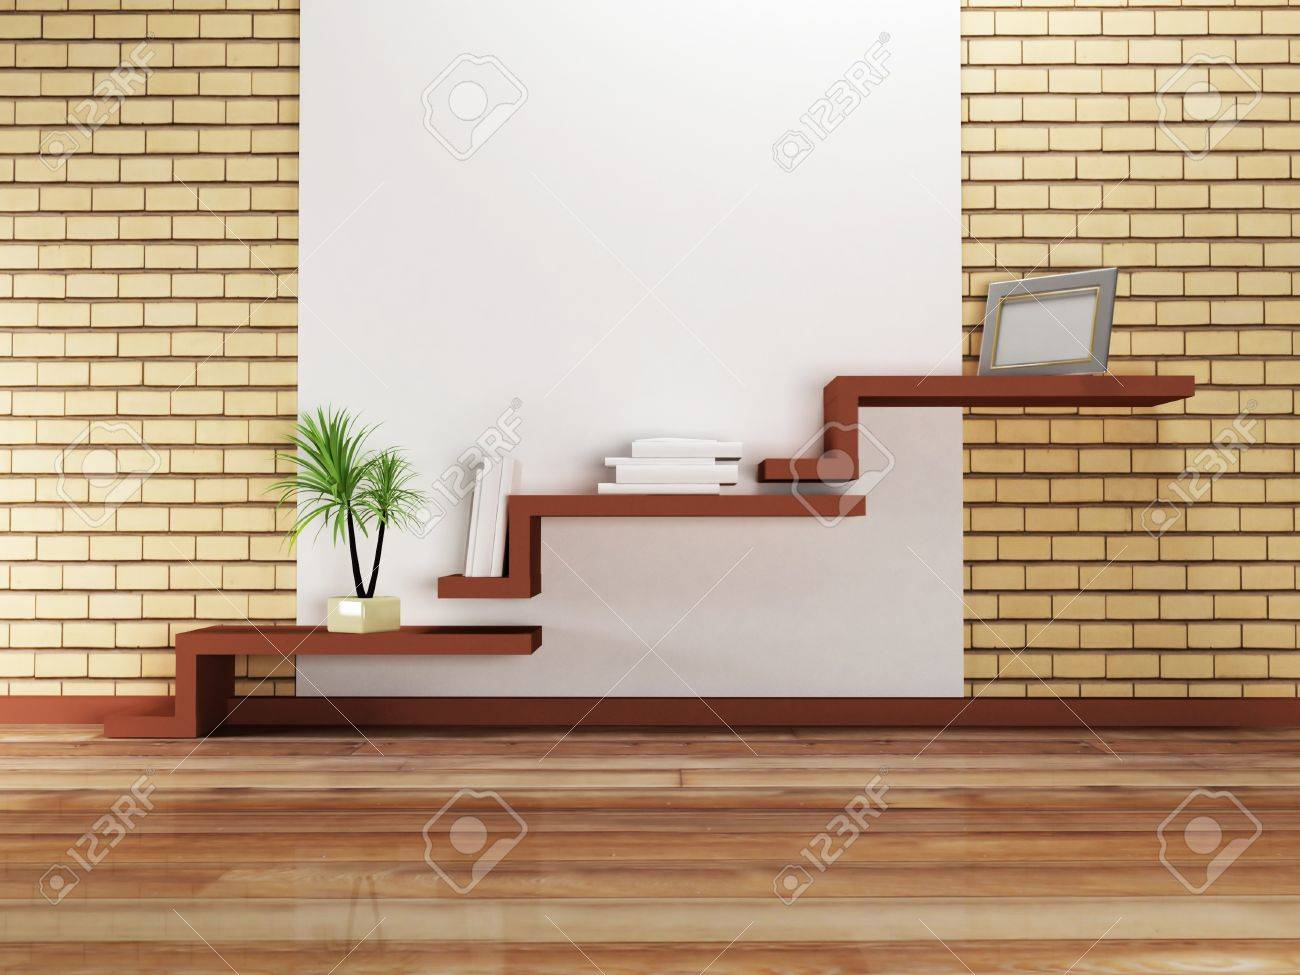 Creative Shelf Creative Shelf On The Wall And A Palm Rendering Stock Photo